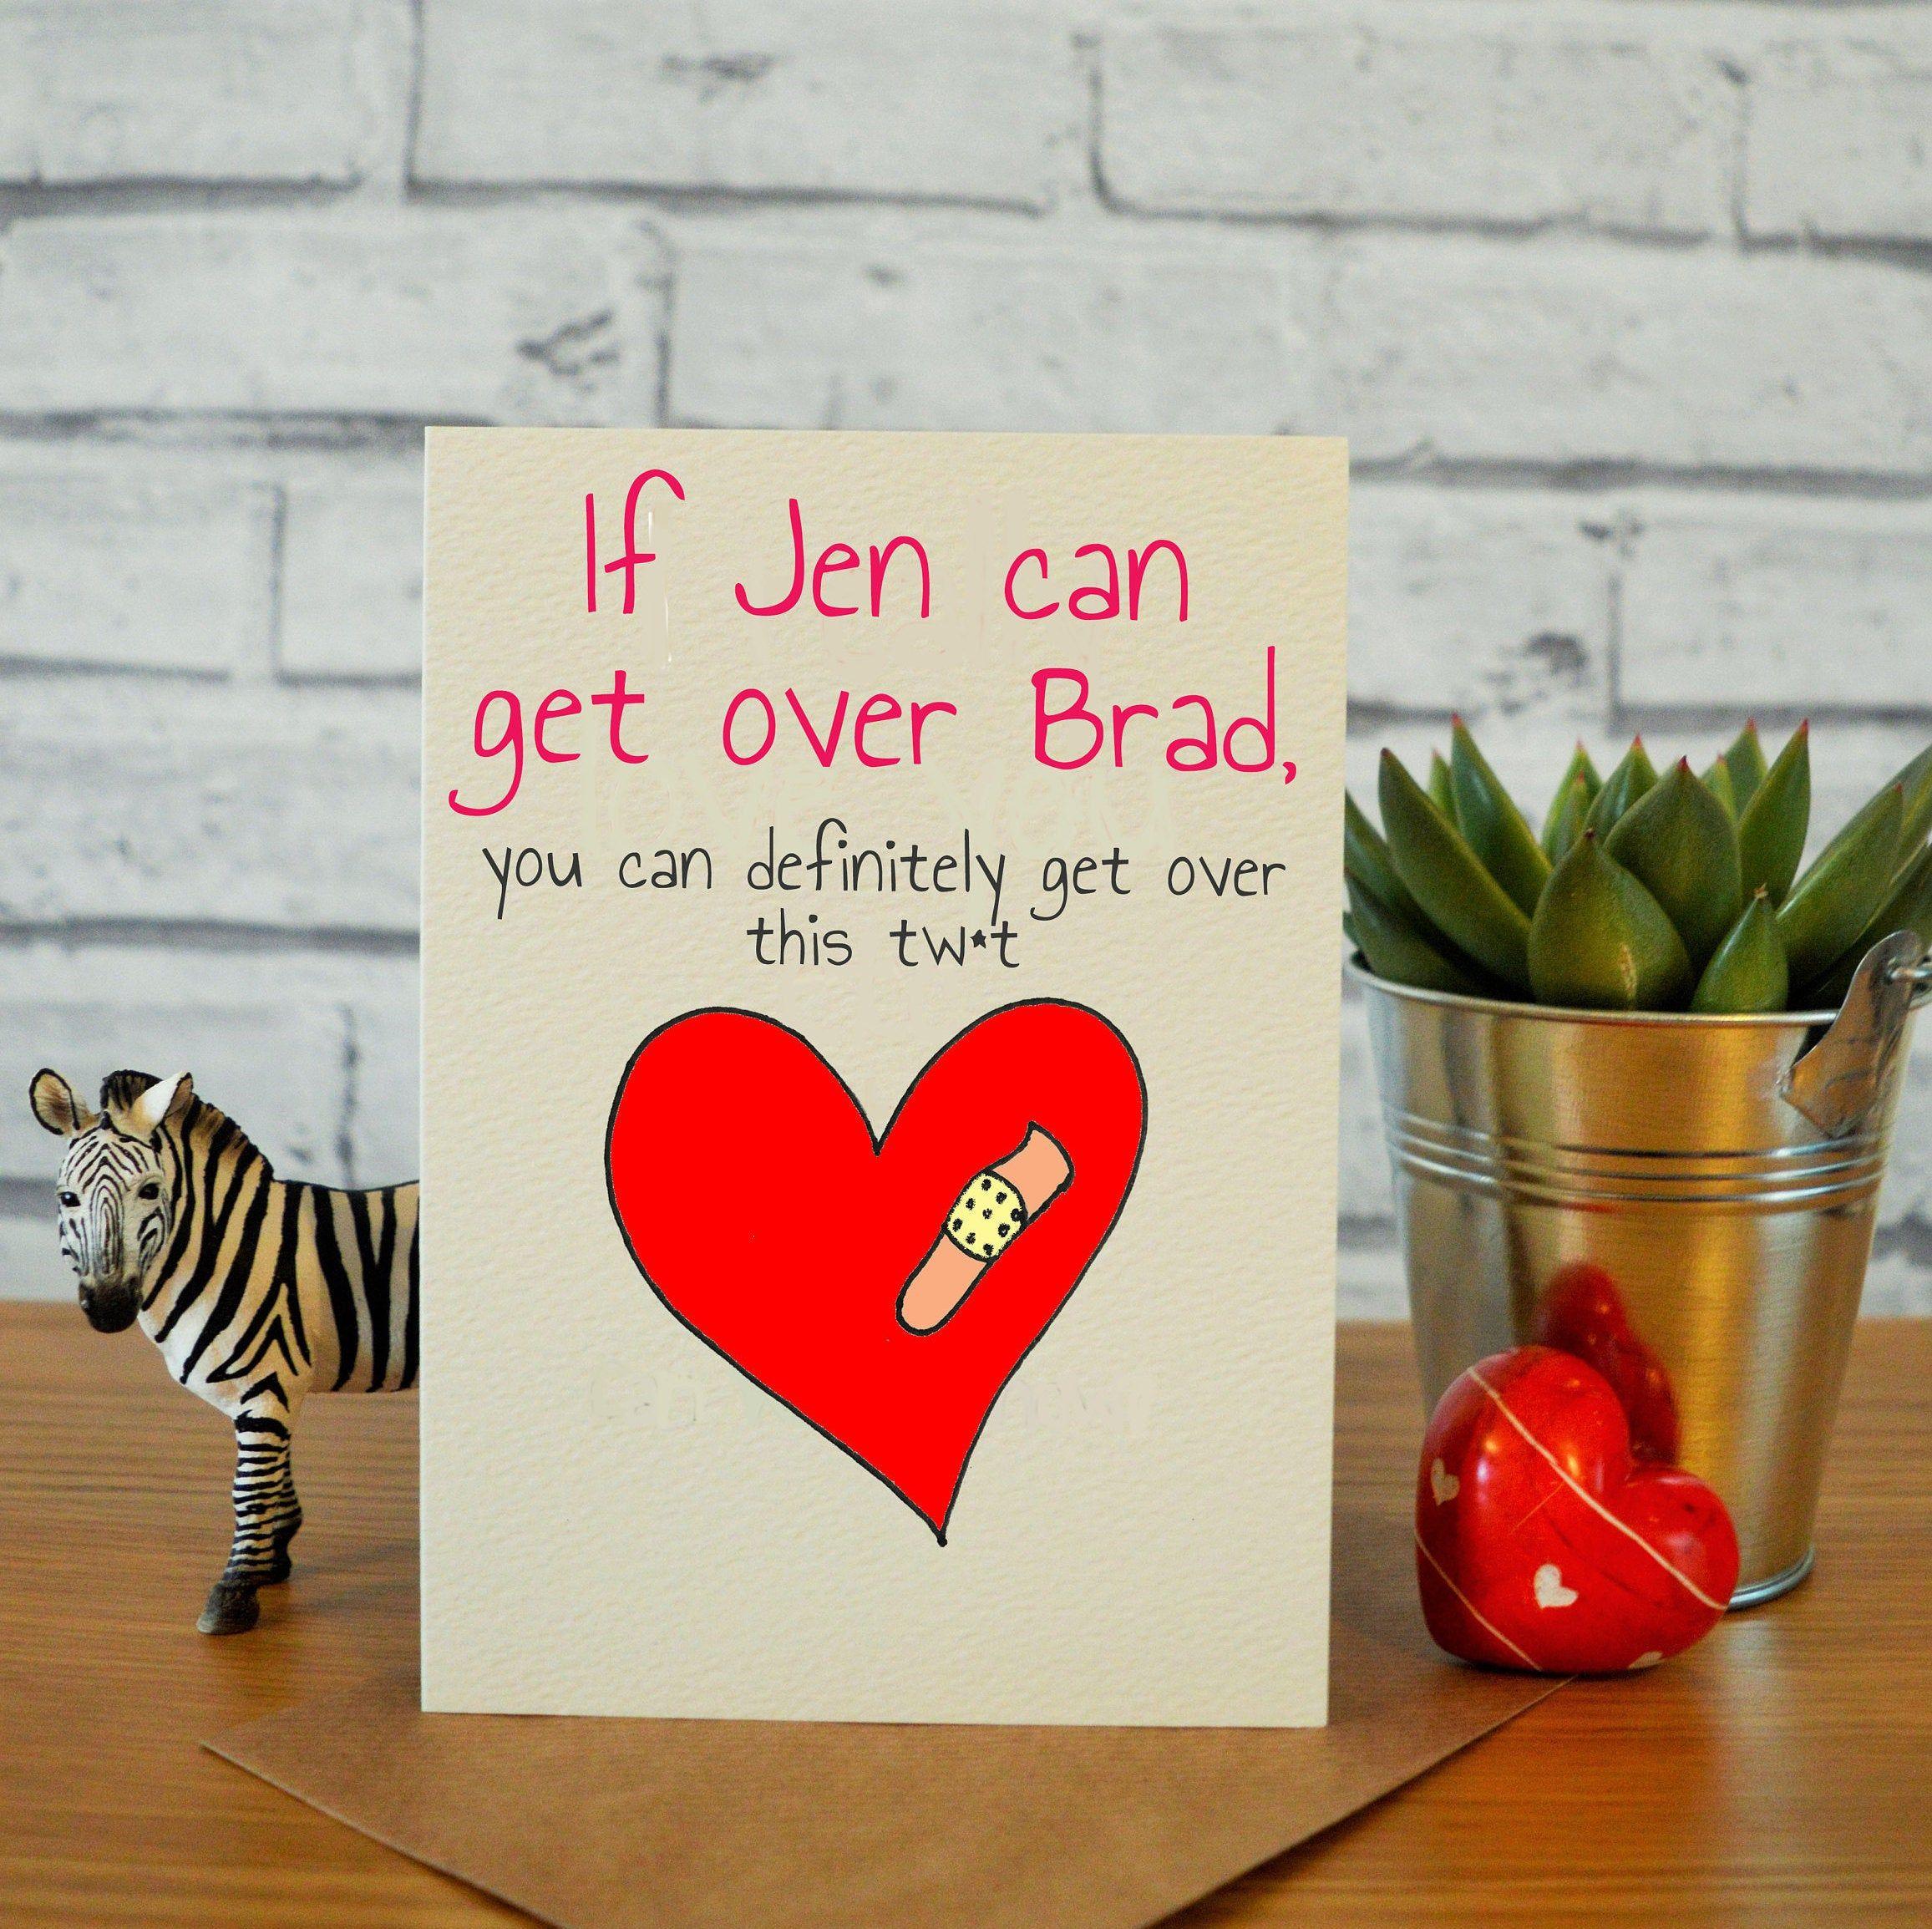 Gifts for break up cheer up gift break up gift break up